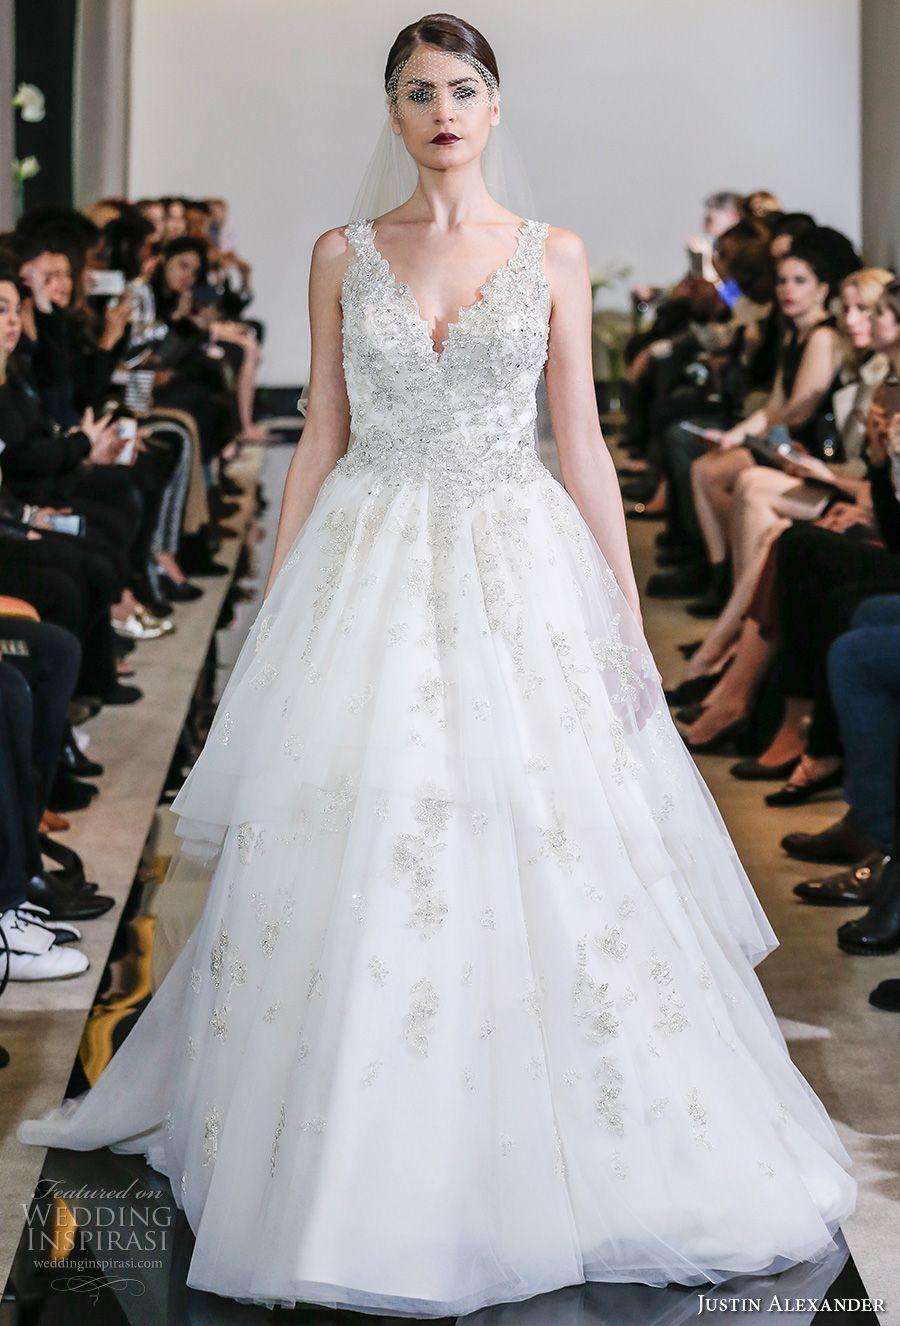 No lace wedding dress october 2018 Катя  и немного лета Фото  Лена Смирнова elenln Макияж